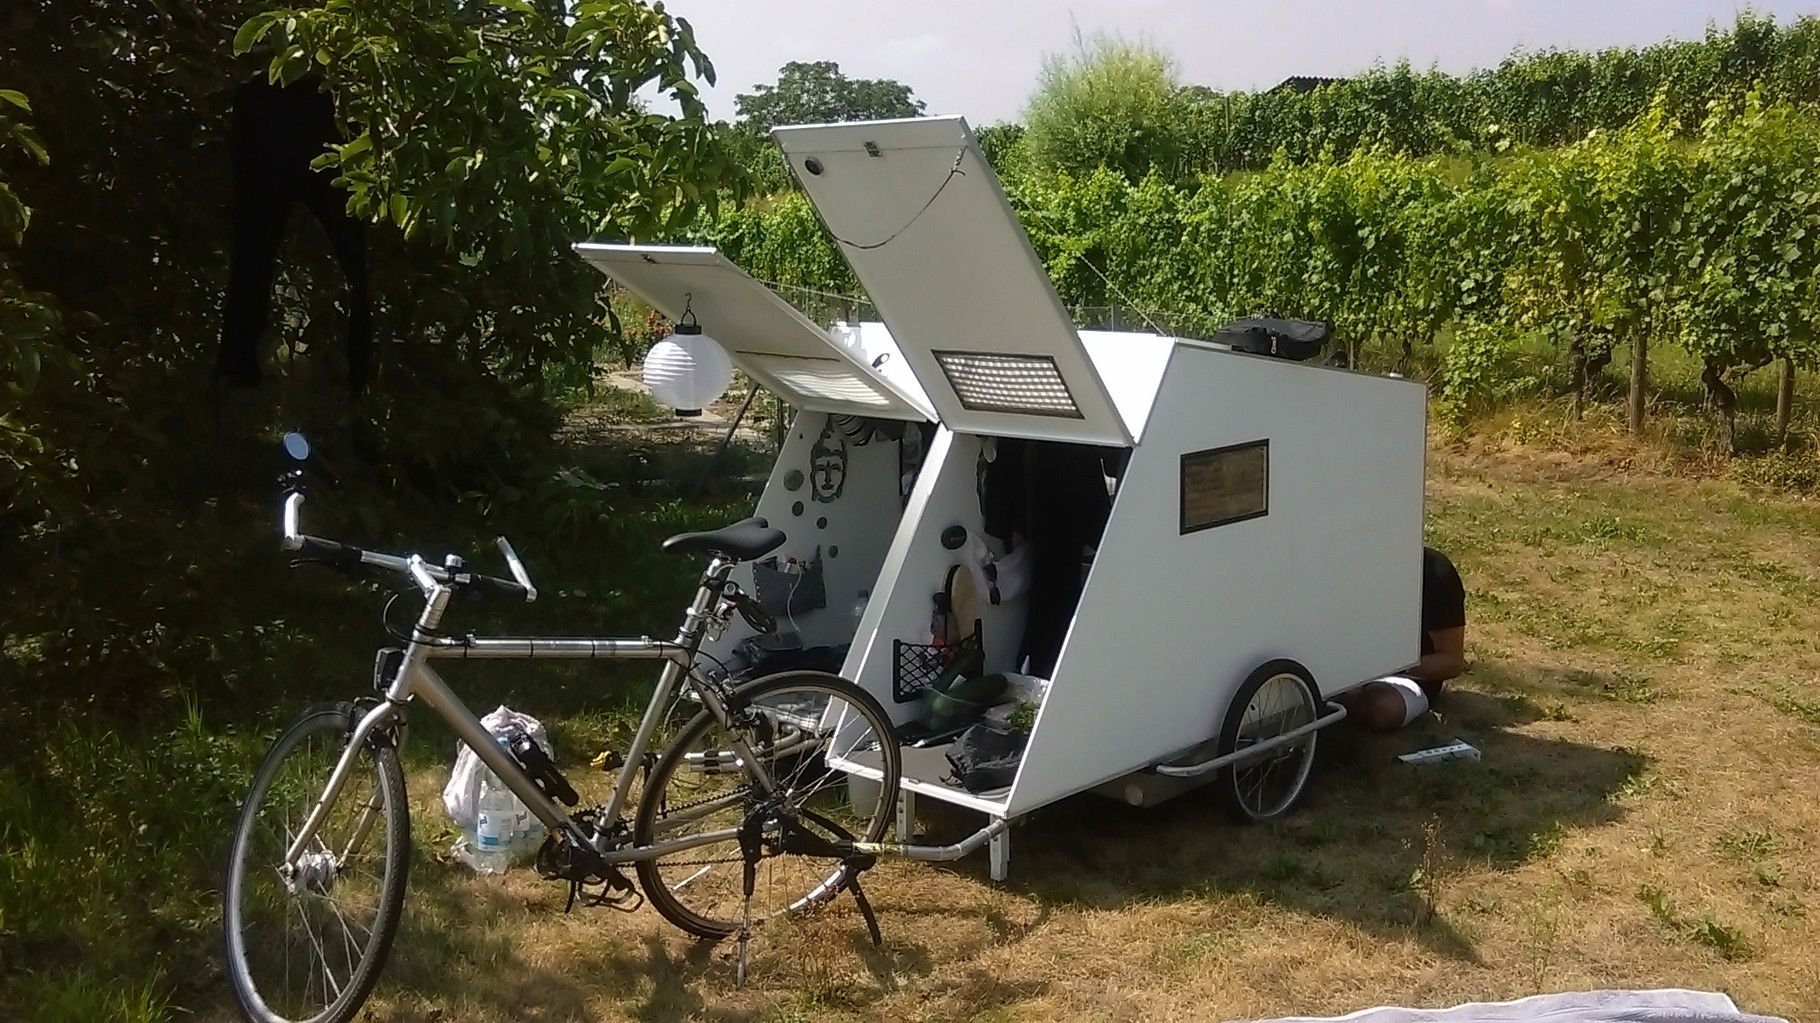 nimburg am kaiserstuhl remorque fahrrad wohnwagen. Black Bedroom Furniture Sets. Home Design Ideas